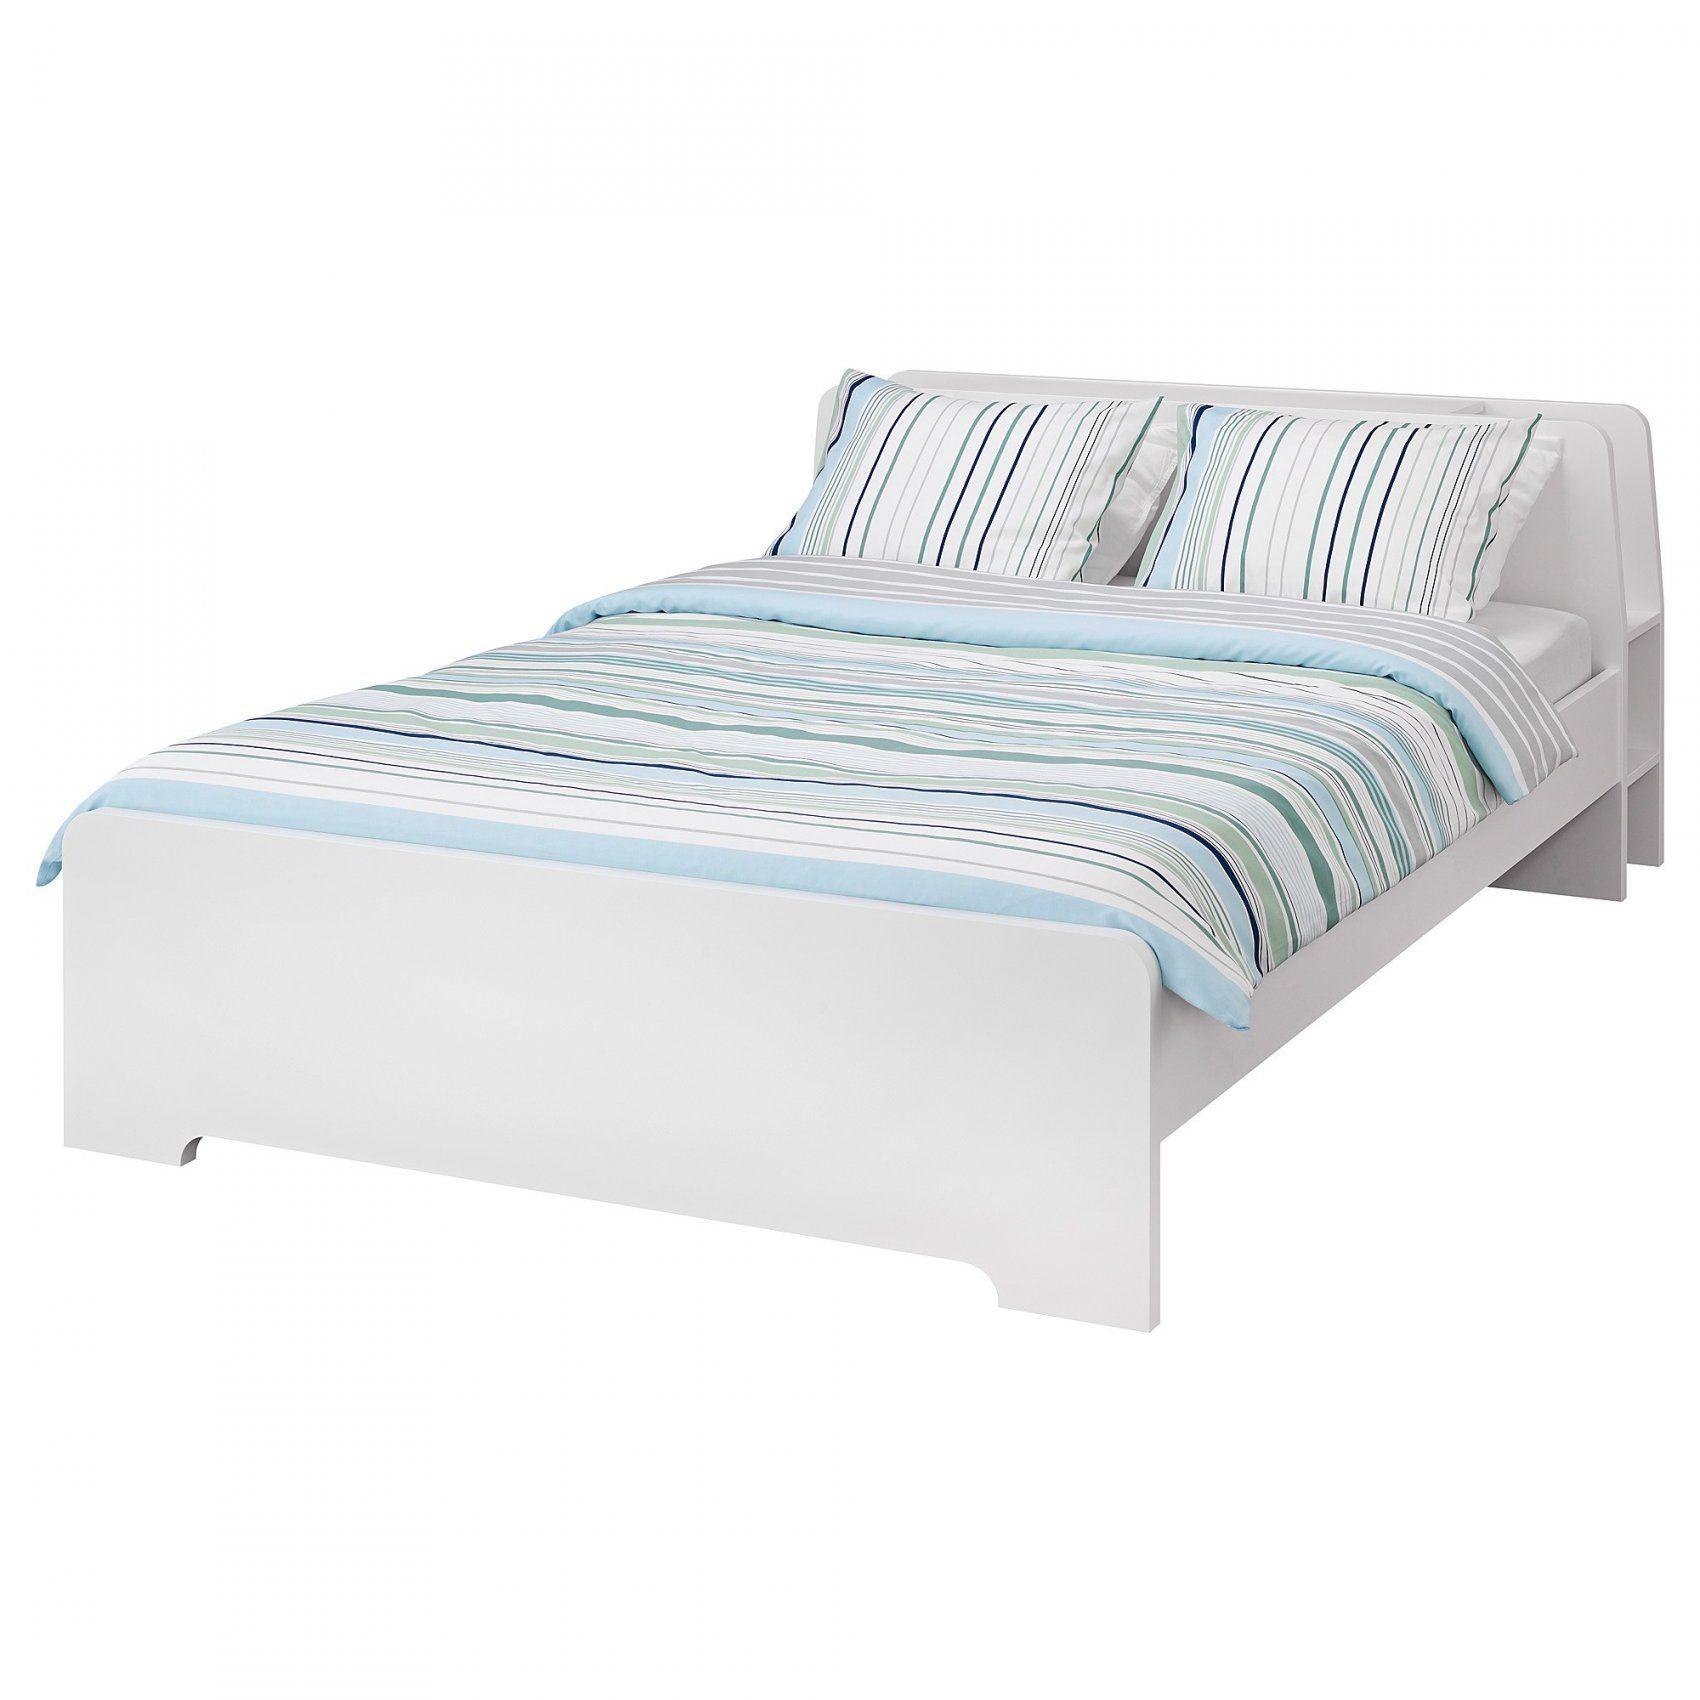 Full Size of Betten Ikea 160x200 Bett Musterring Mit Aufbewahrung Gebrauchte Billerbeck Günstige 140x200 Ruf Preise Küche Kaufen Lattenrost Bett Betten Ikea 160x200